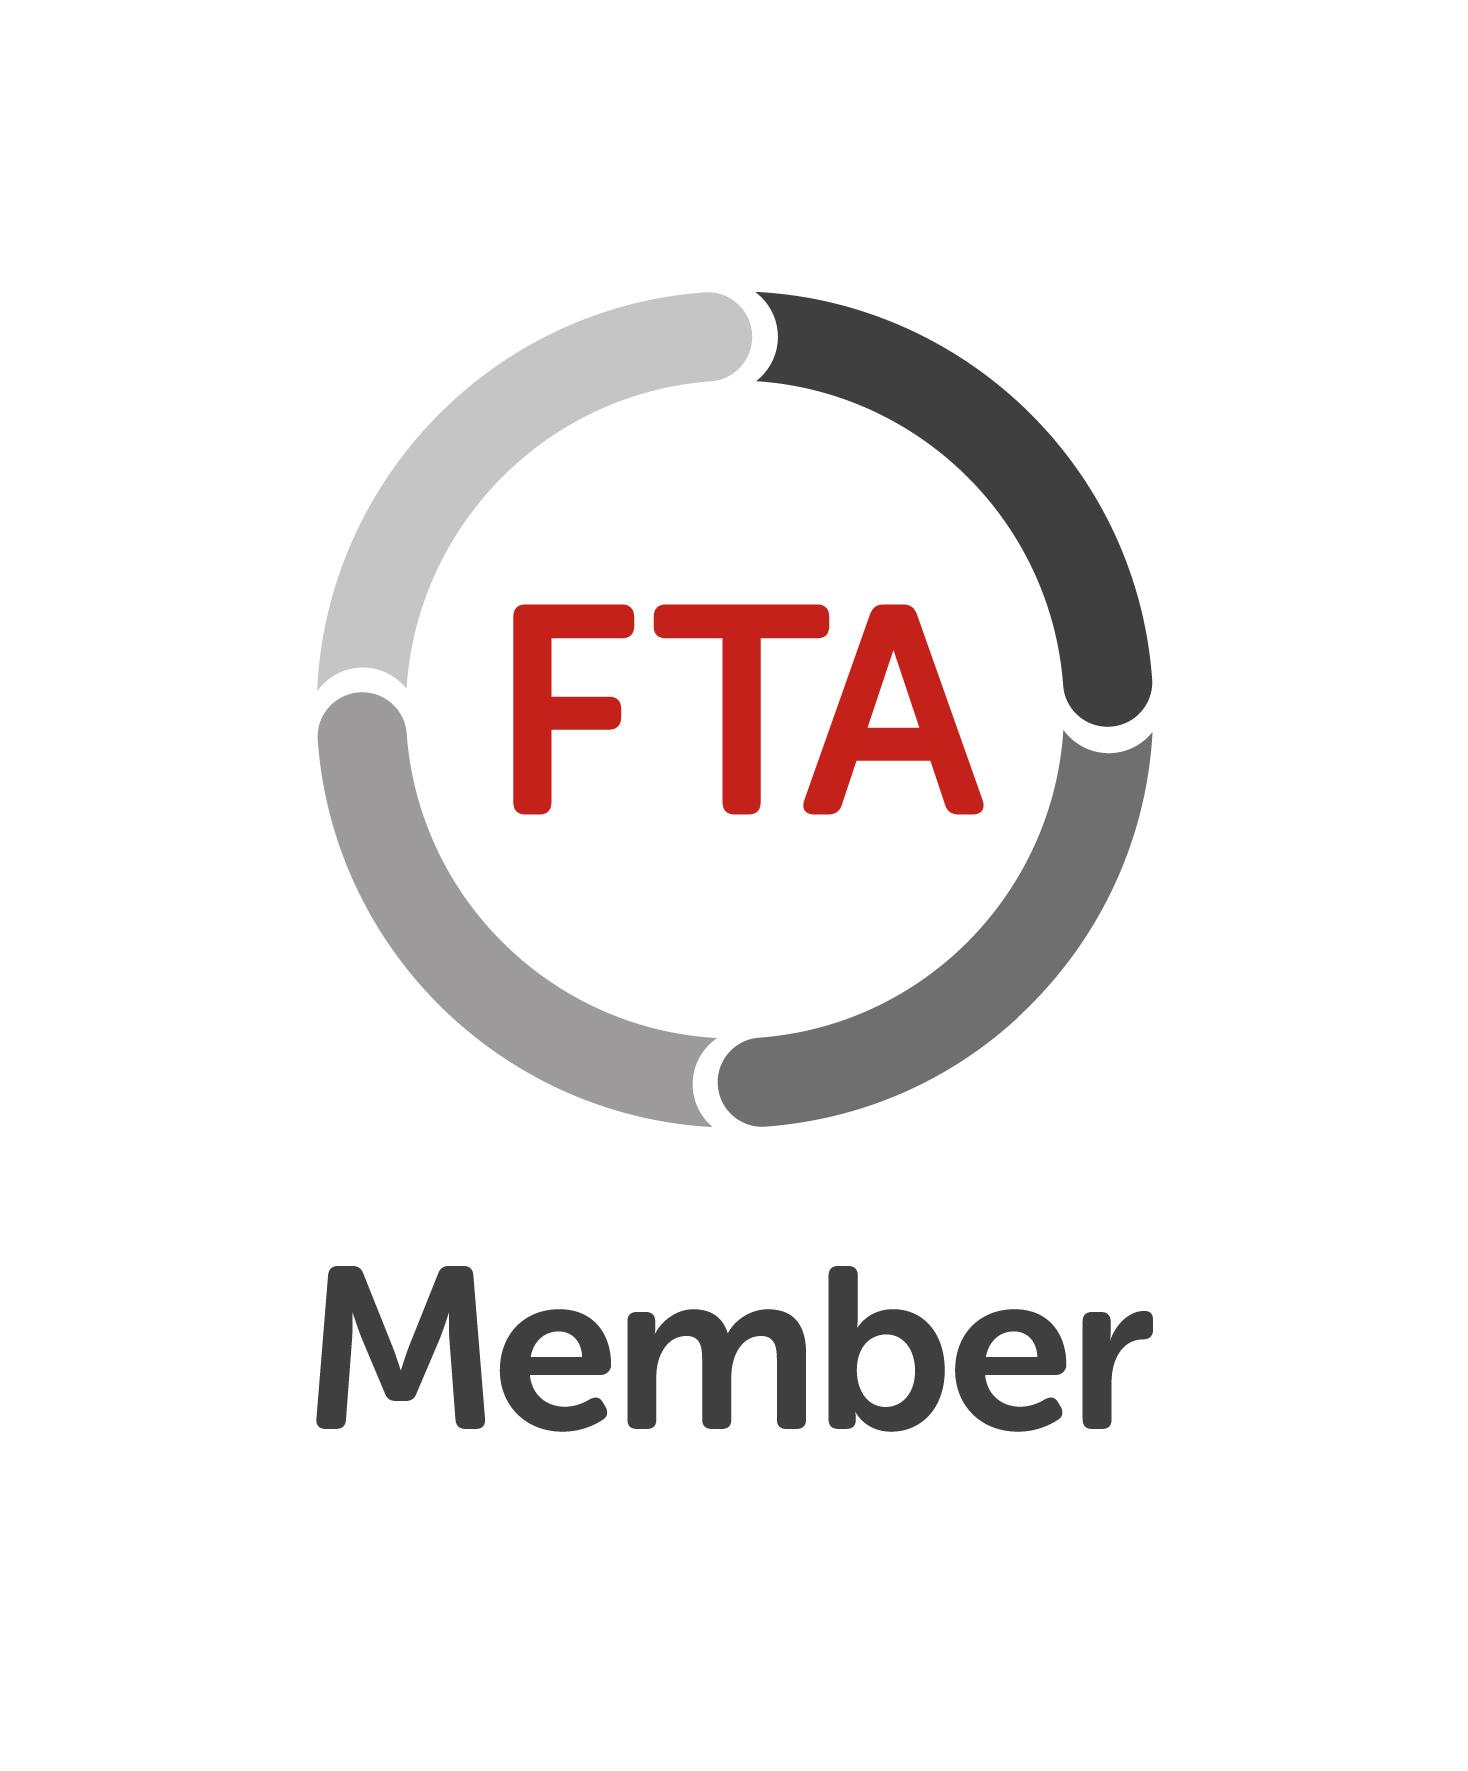 FTA Member logo Vertical RGB.JPG